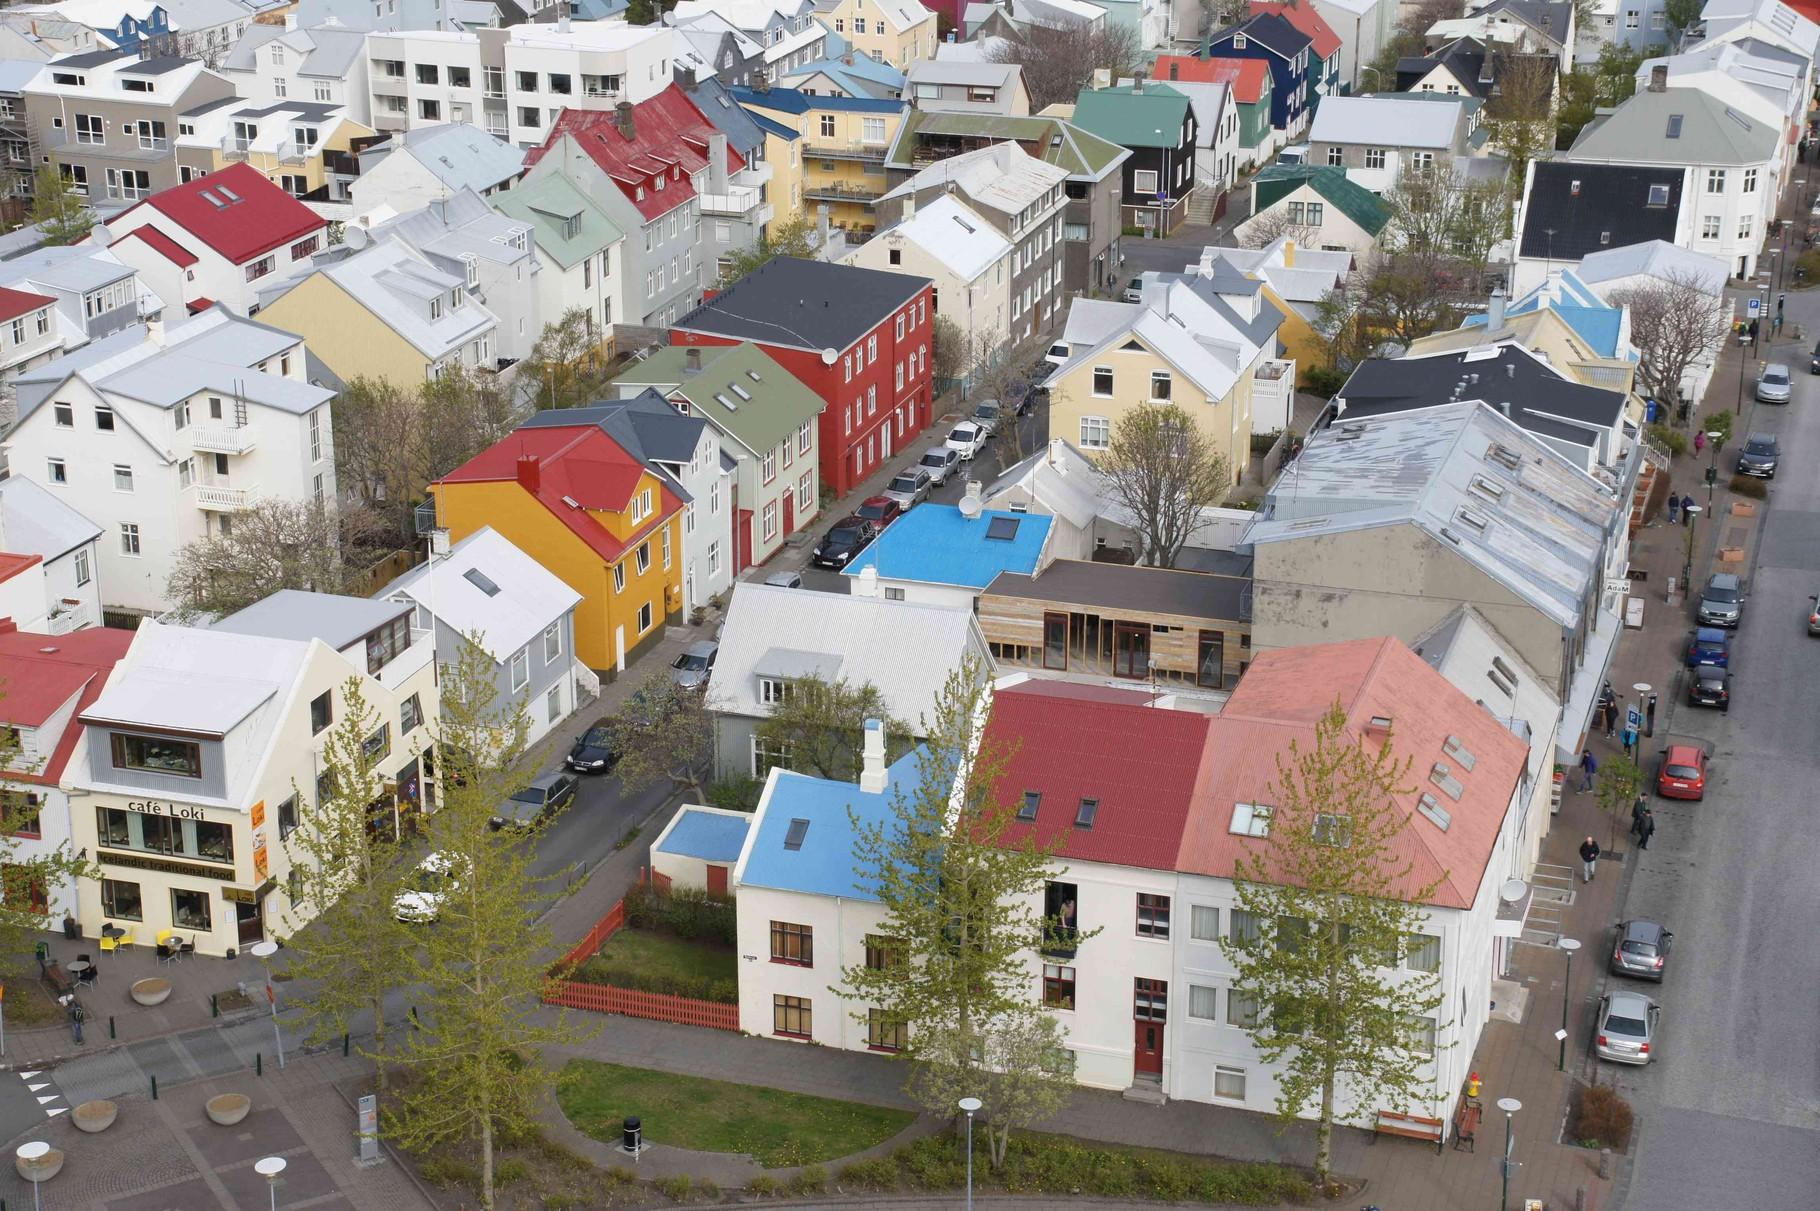 Reykjavík - angenehm bunt und lebendig